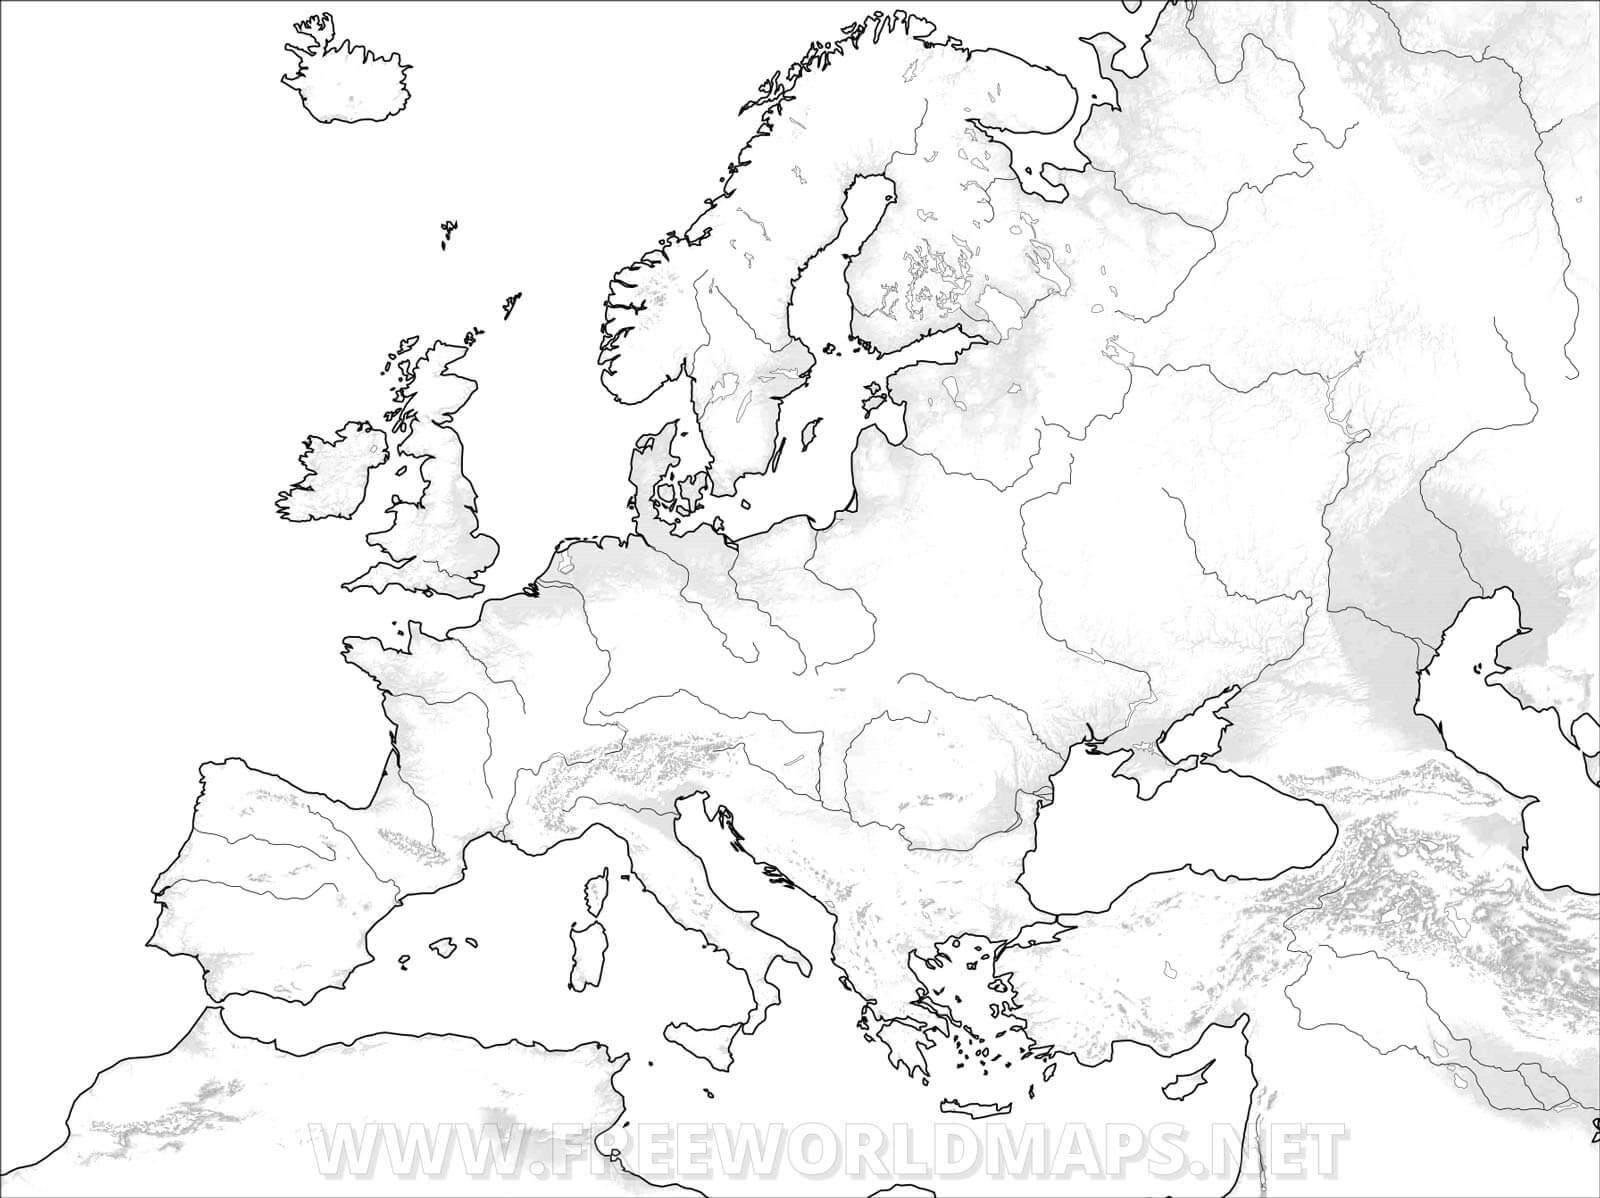 Europakarten Freeworldmaps Net